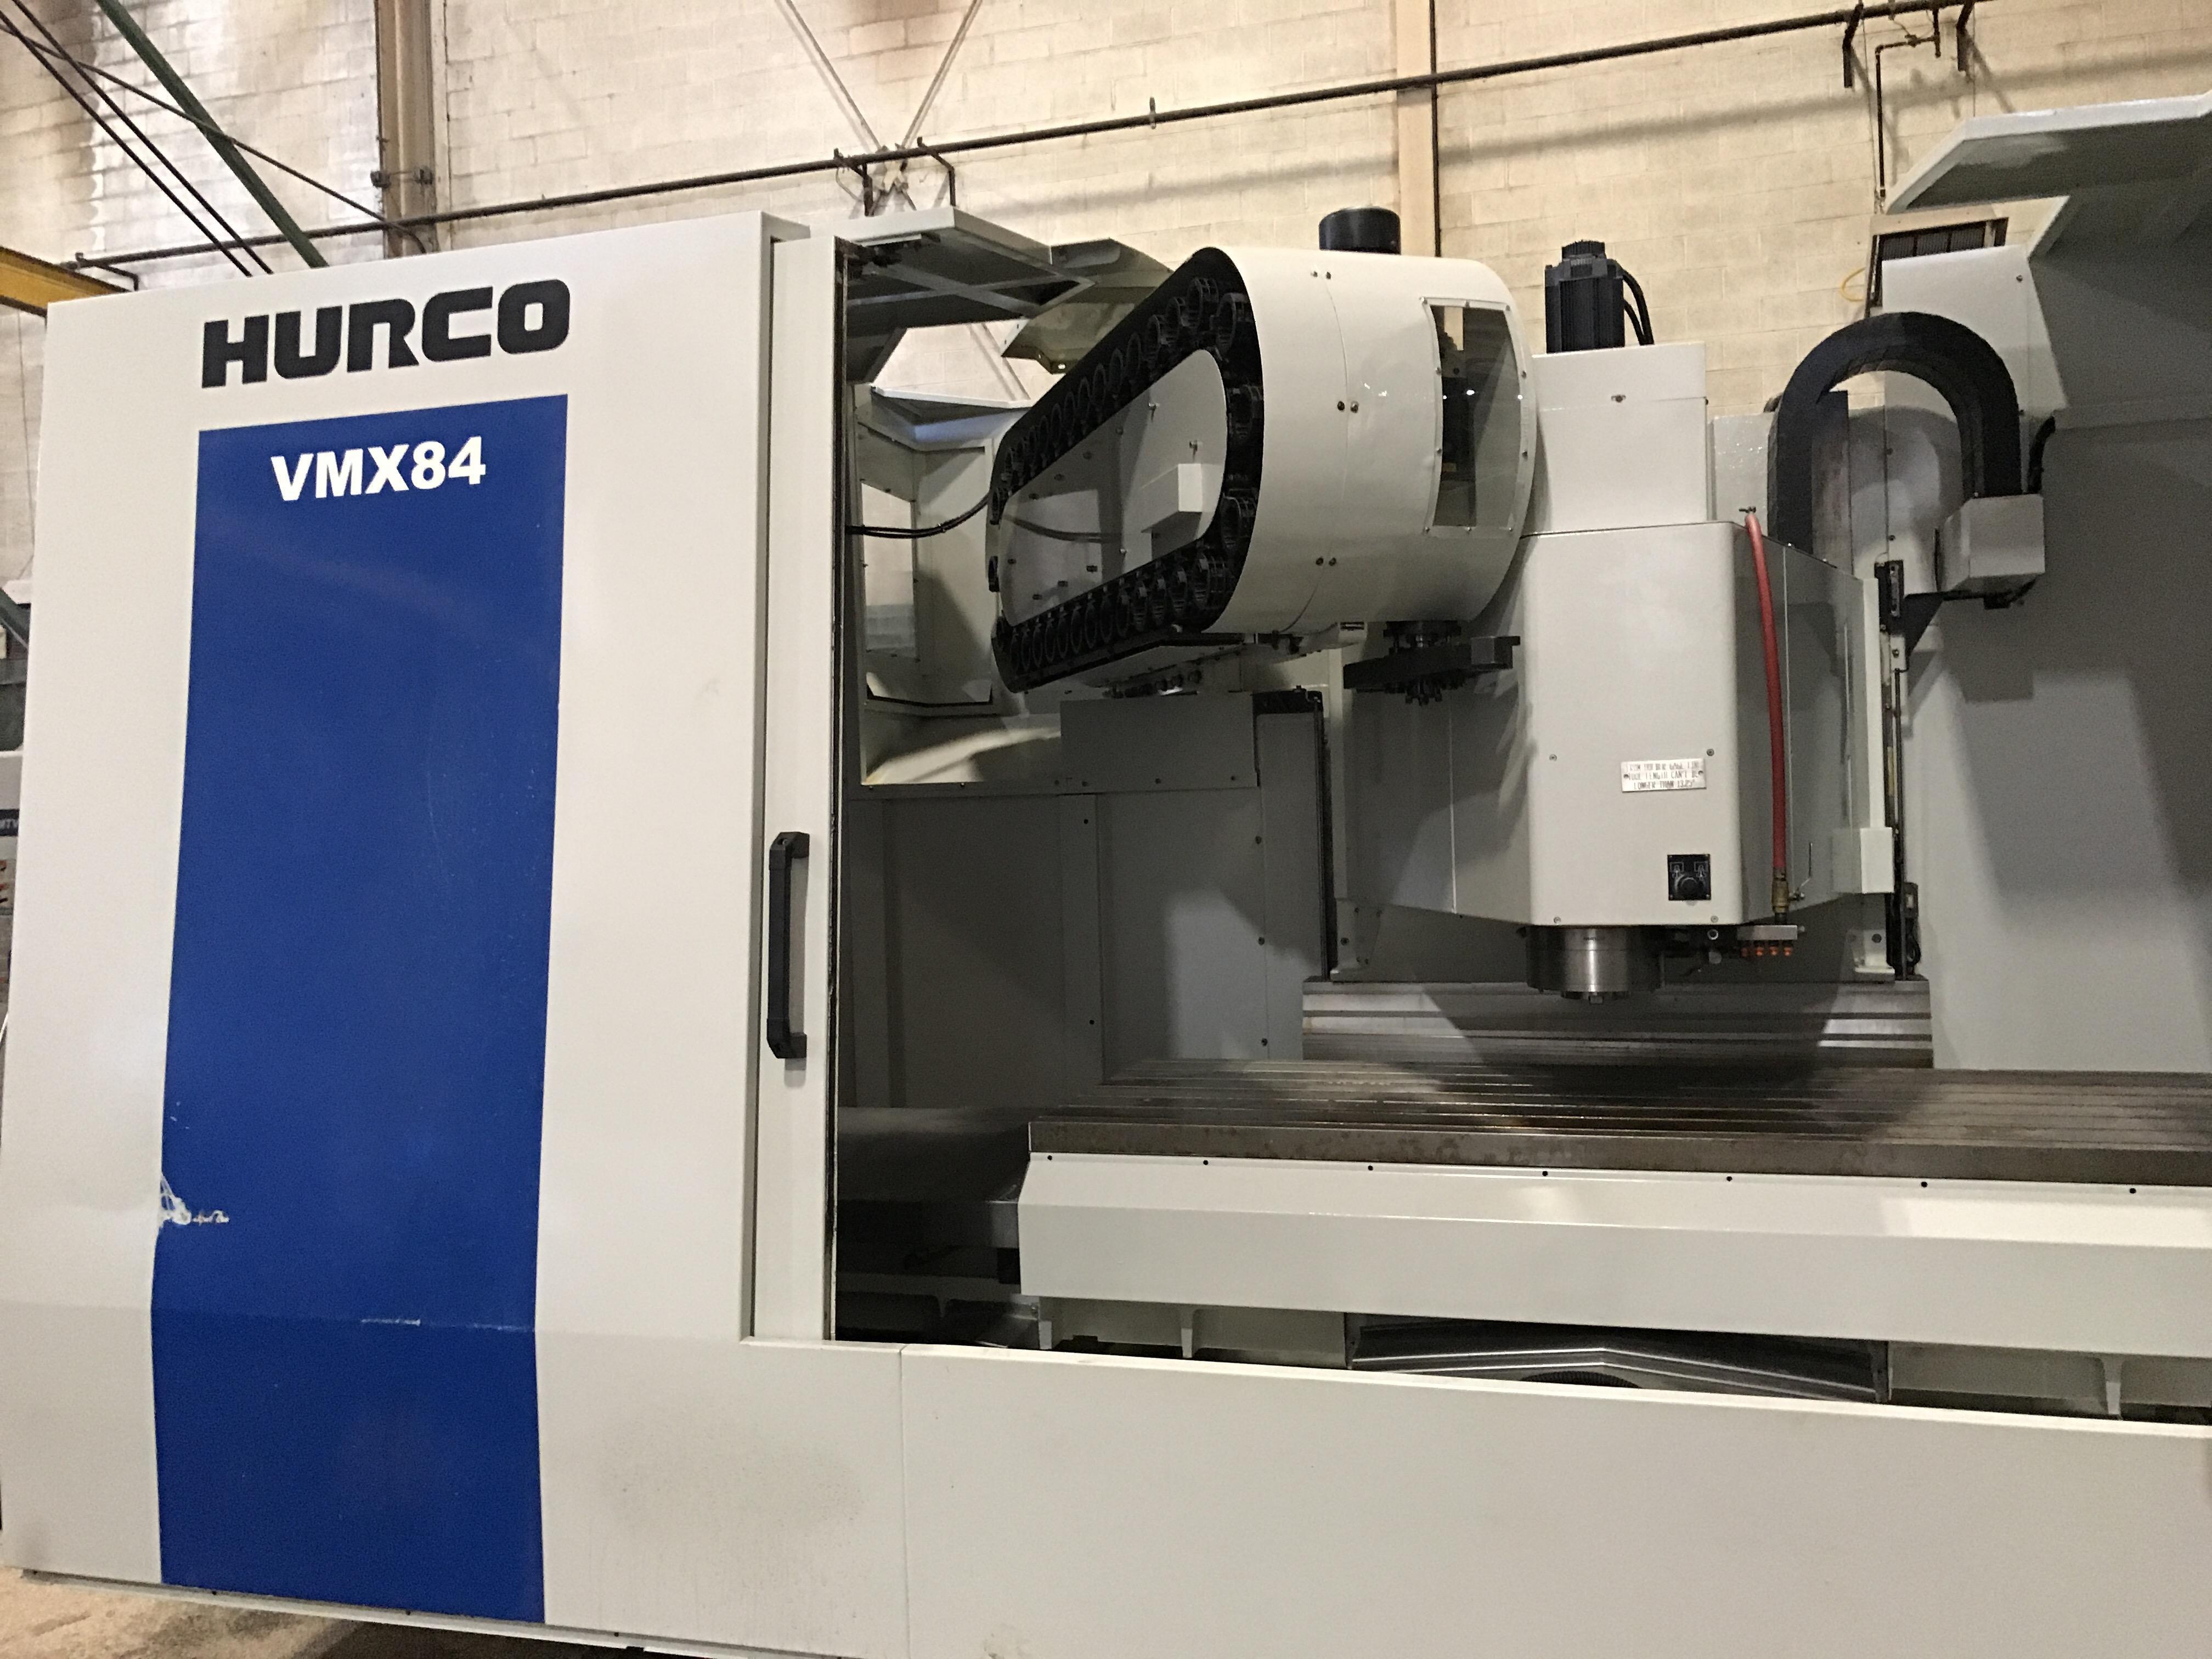 2012 HURCO VMX-84 | Tramar Industries